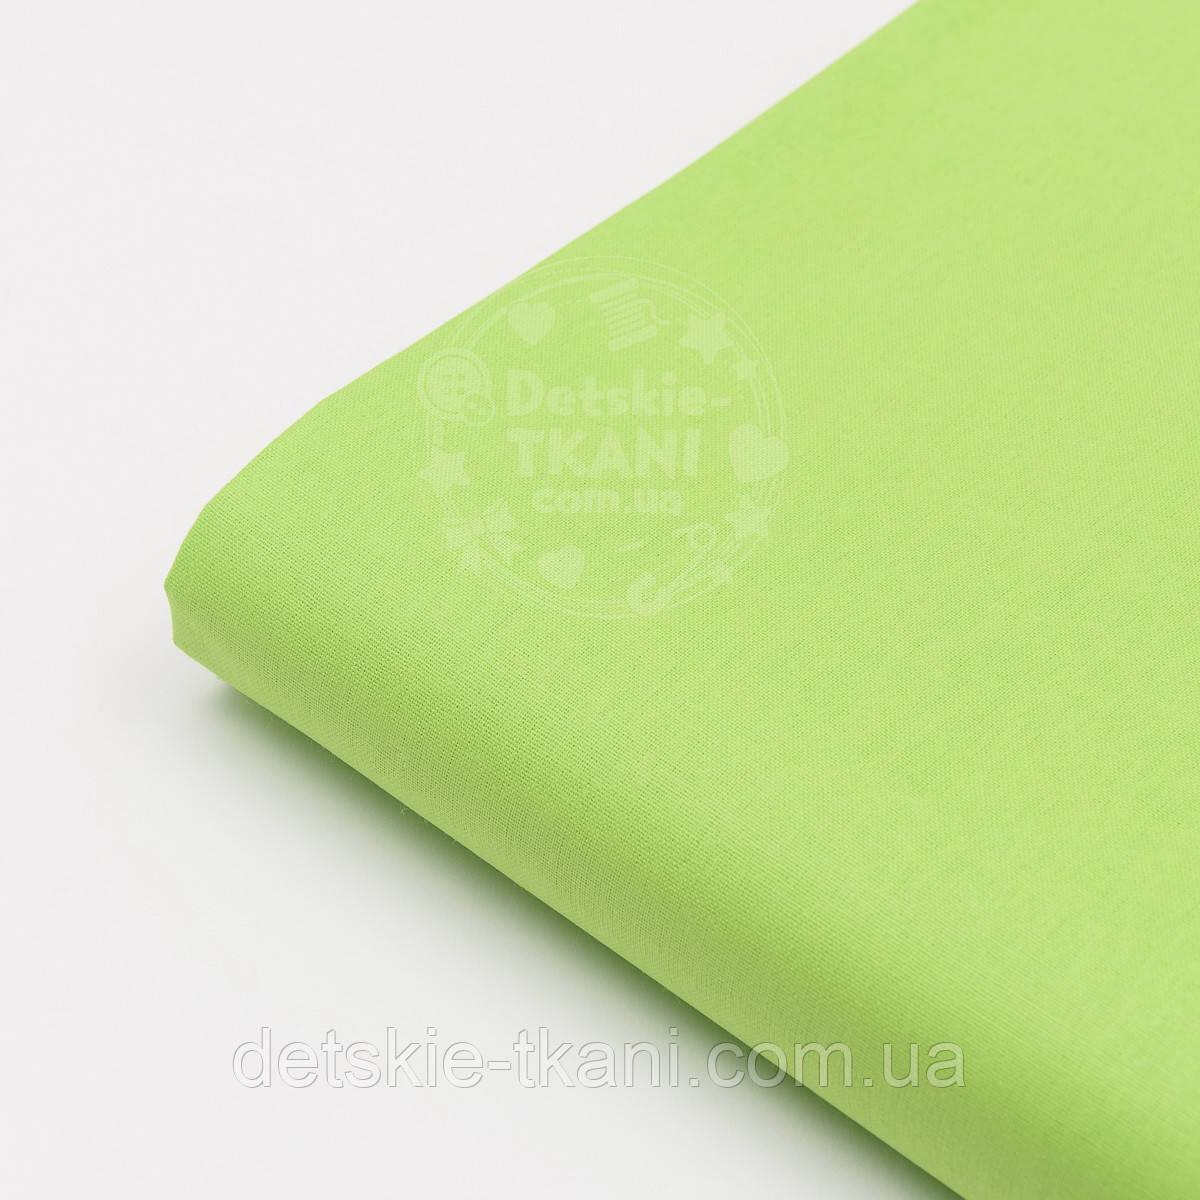 Отрез ткани №37 однотонной бязи зелёного цвета, размер 70*160